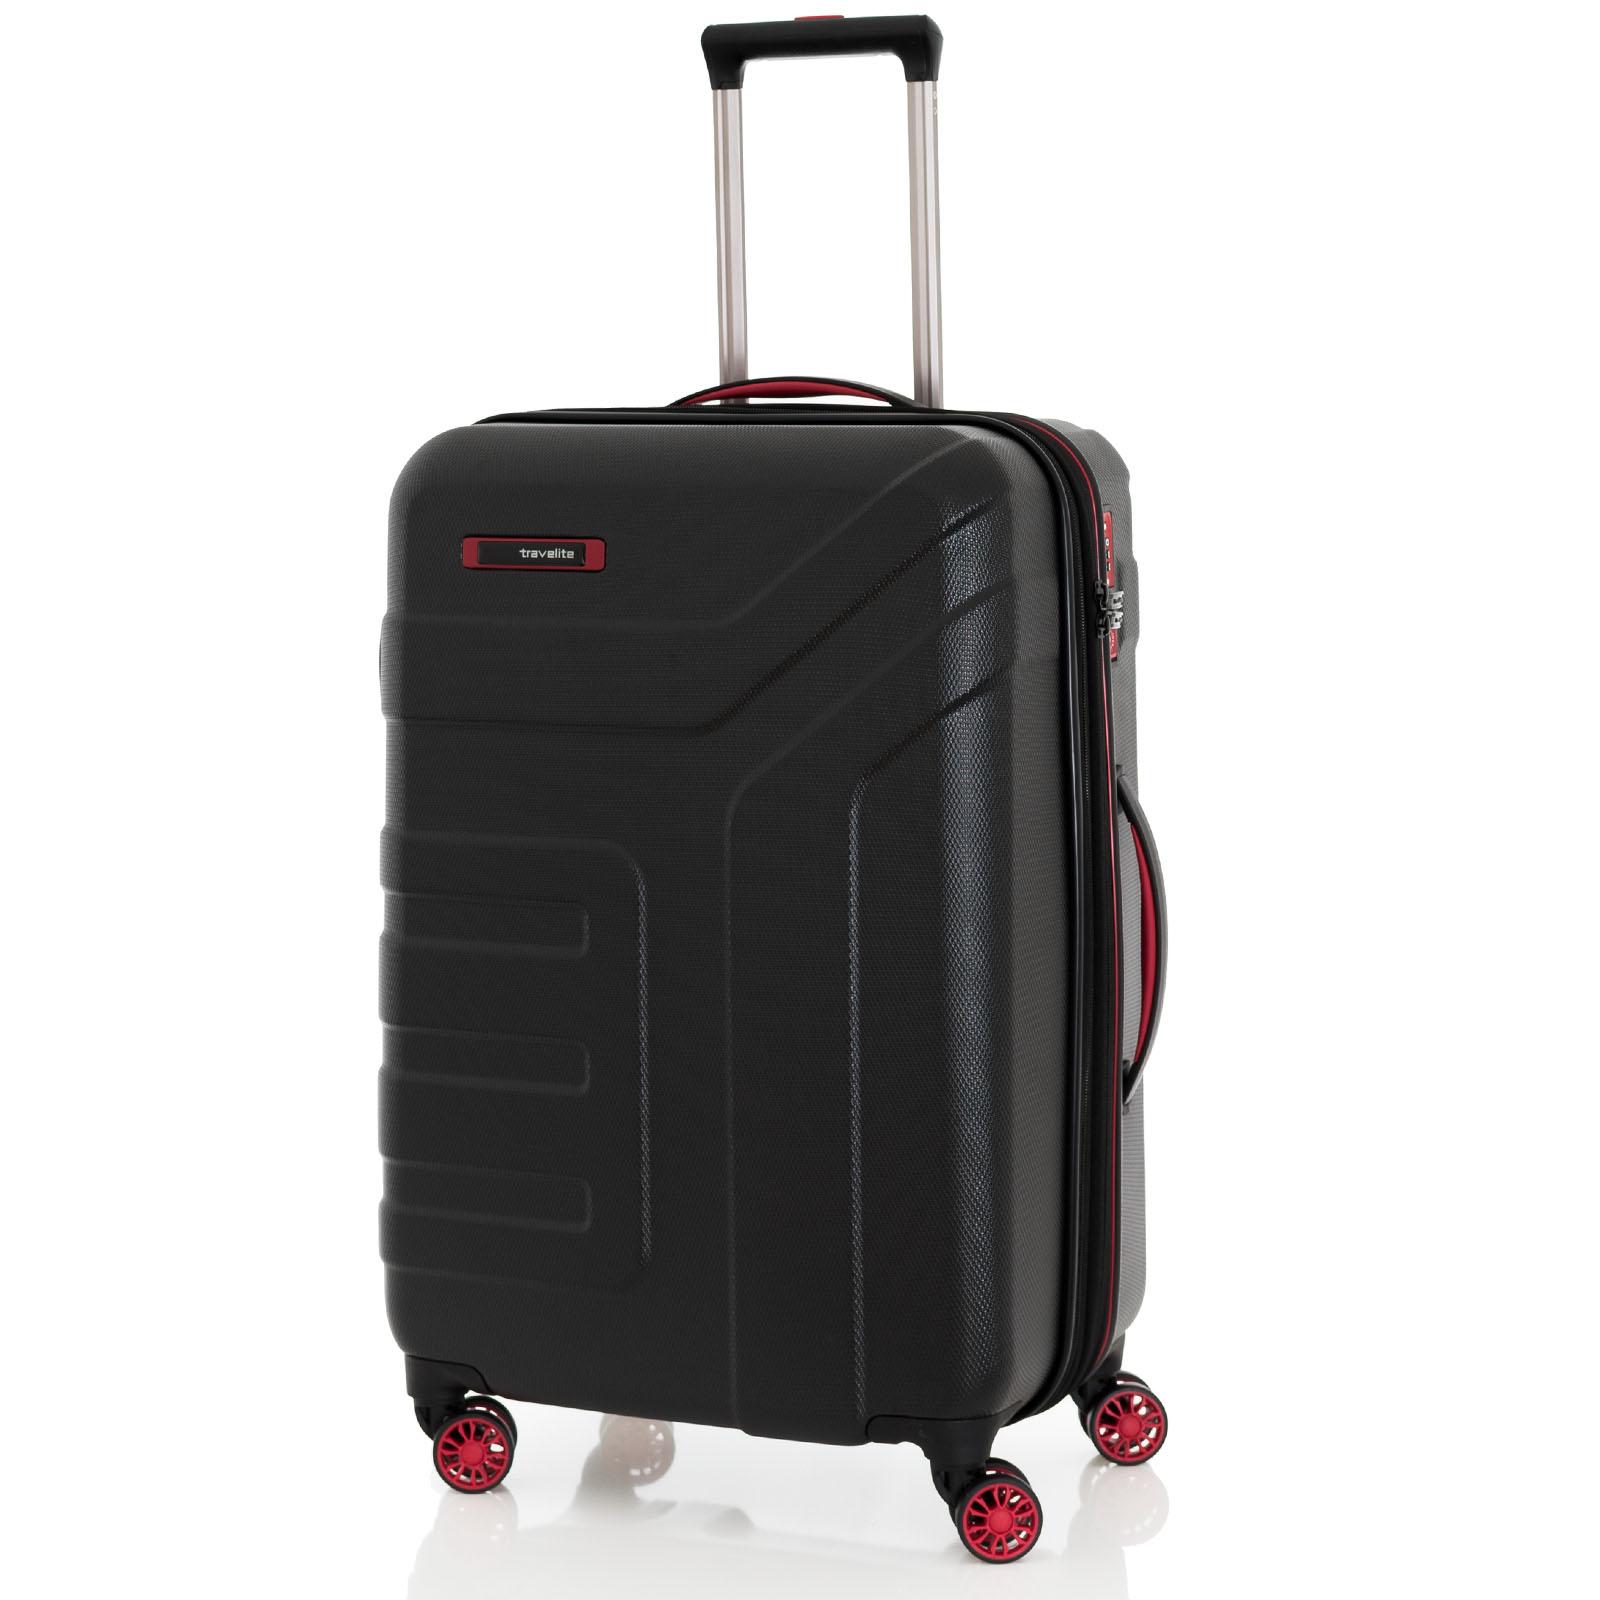 travelite-vector-schwarz-70cm-hartschalen-trolley